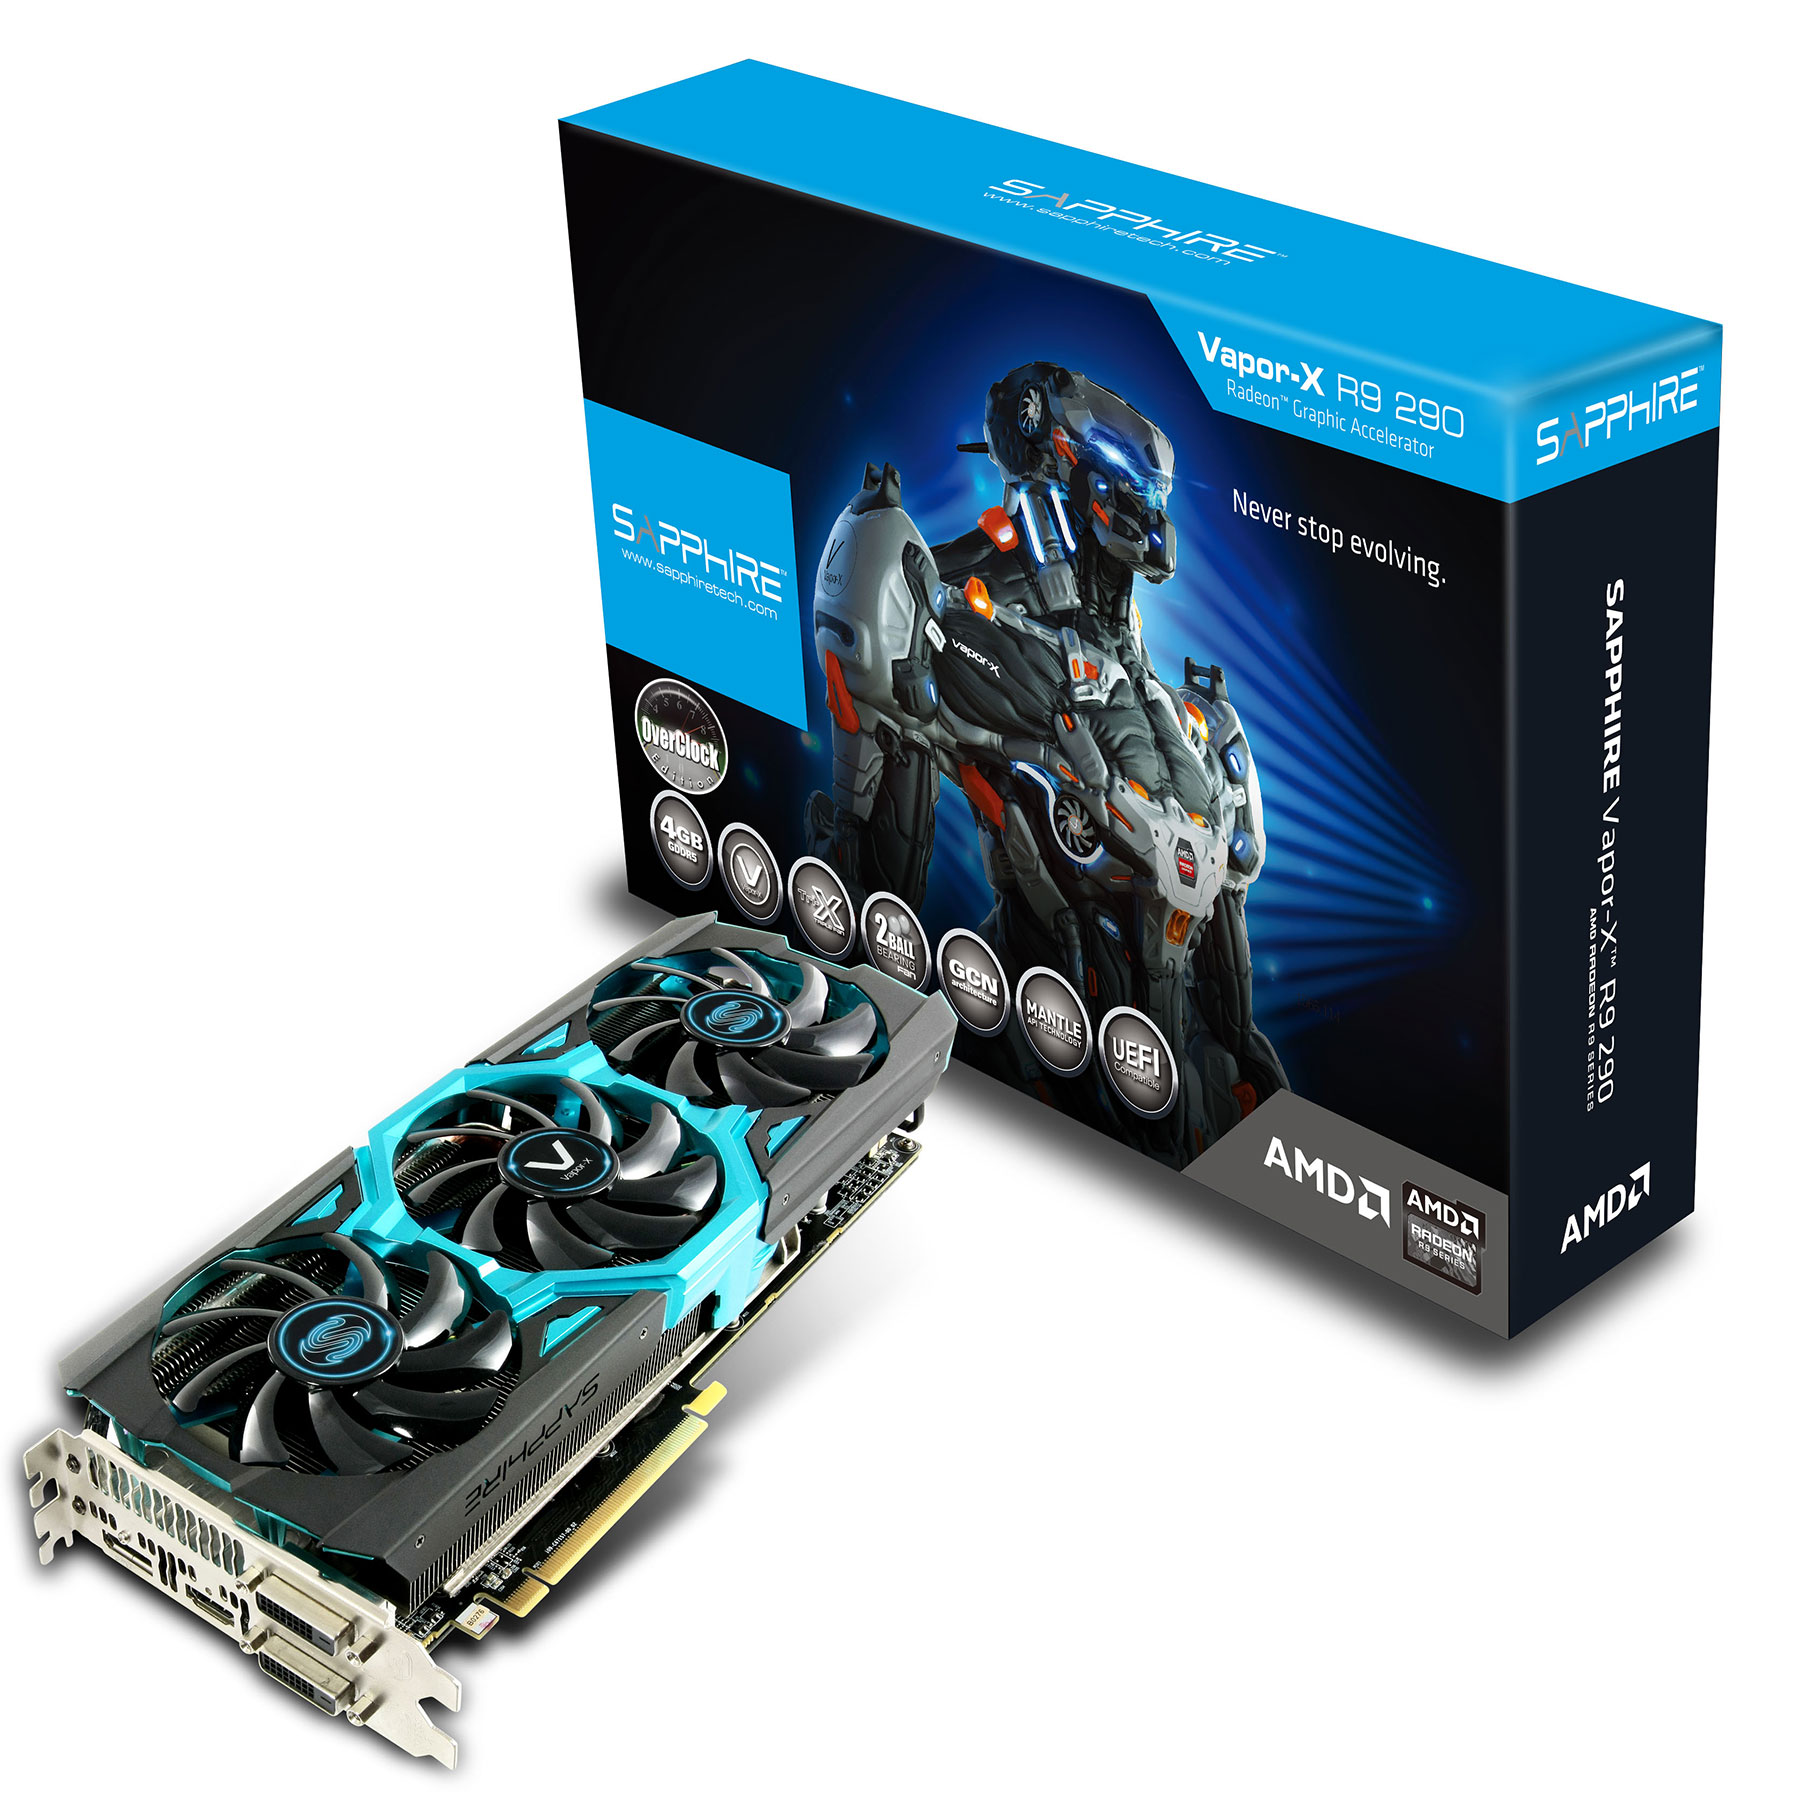 Carte graphique Sapphire Radeon R9 290 Vapor-X 4G GDDR5 Tri-X OC 4 Go Dual DVI/HDMI/DisplayPort - PCI Express (AMD Radeon R9 290)